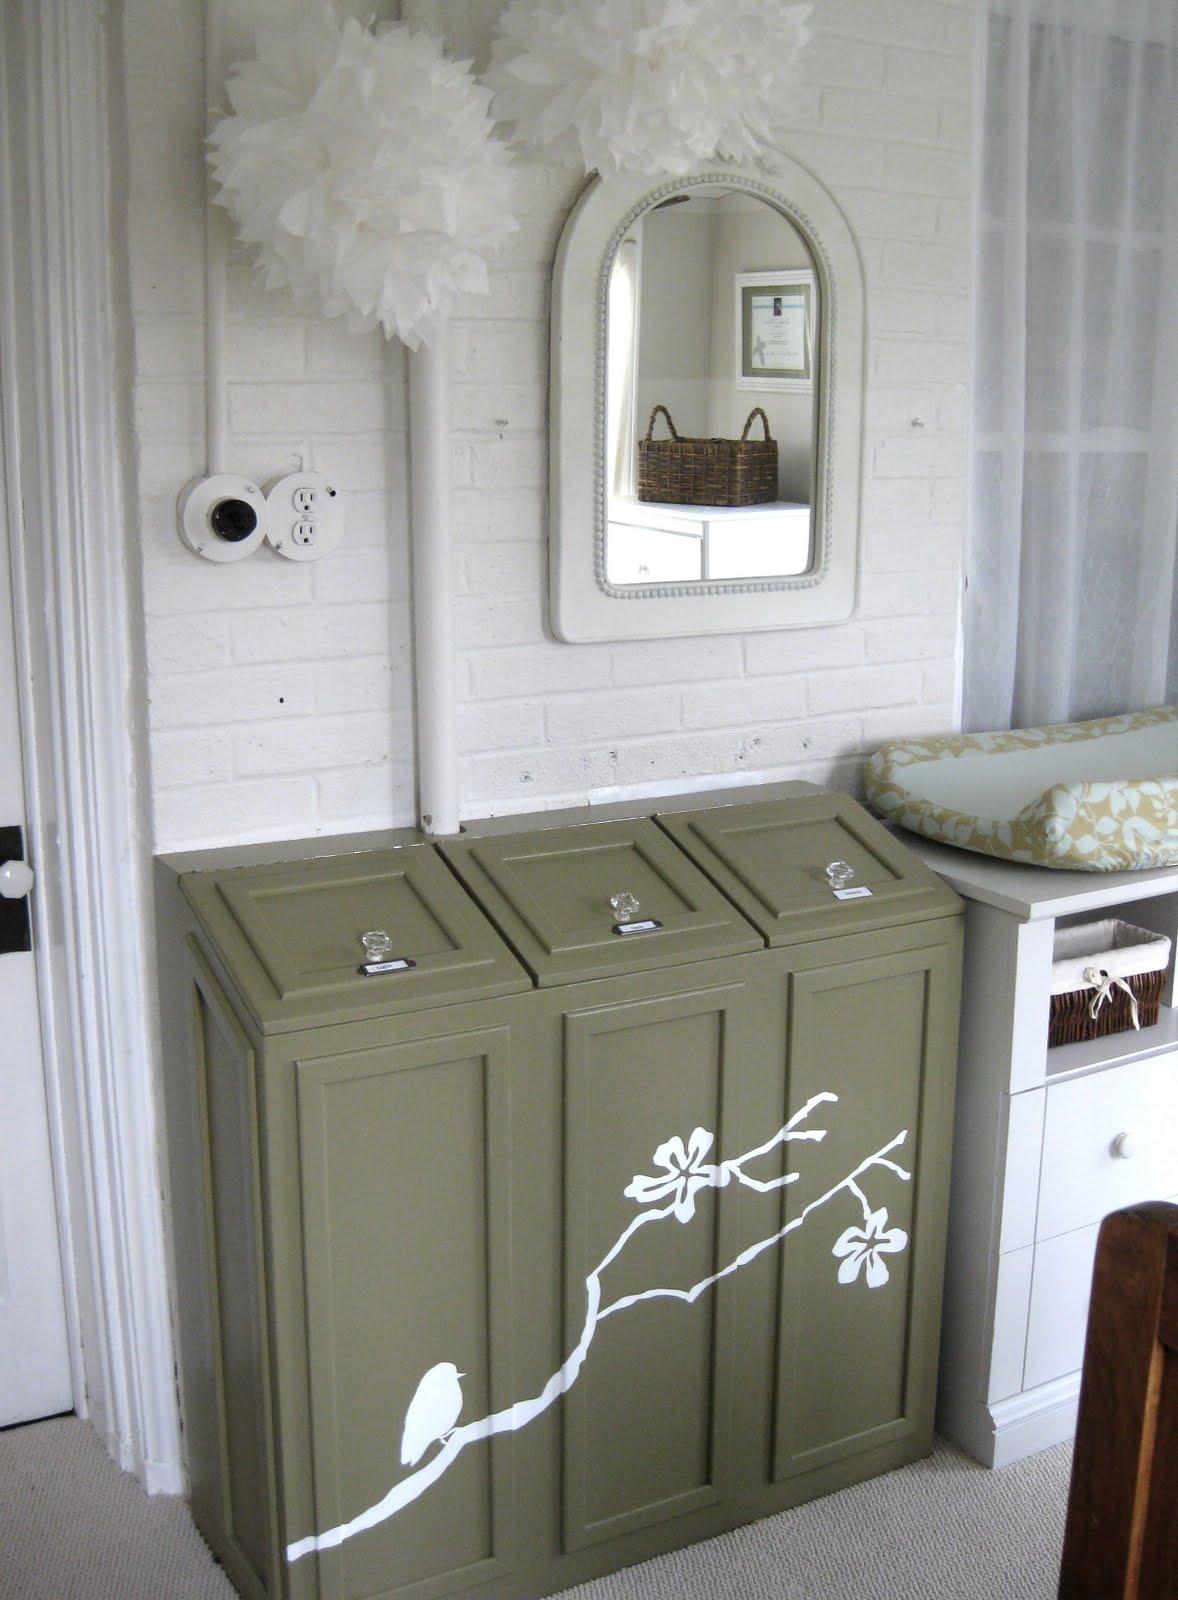 Laundry Chute Cabinet